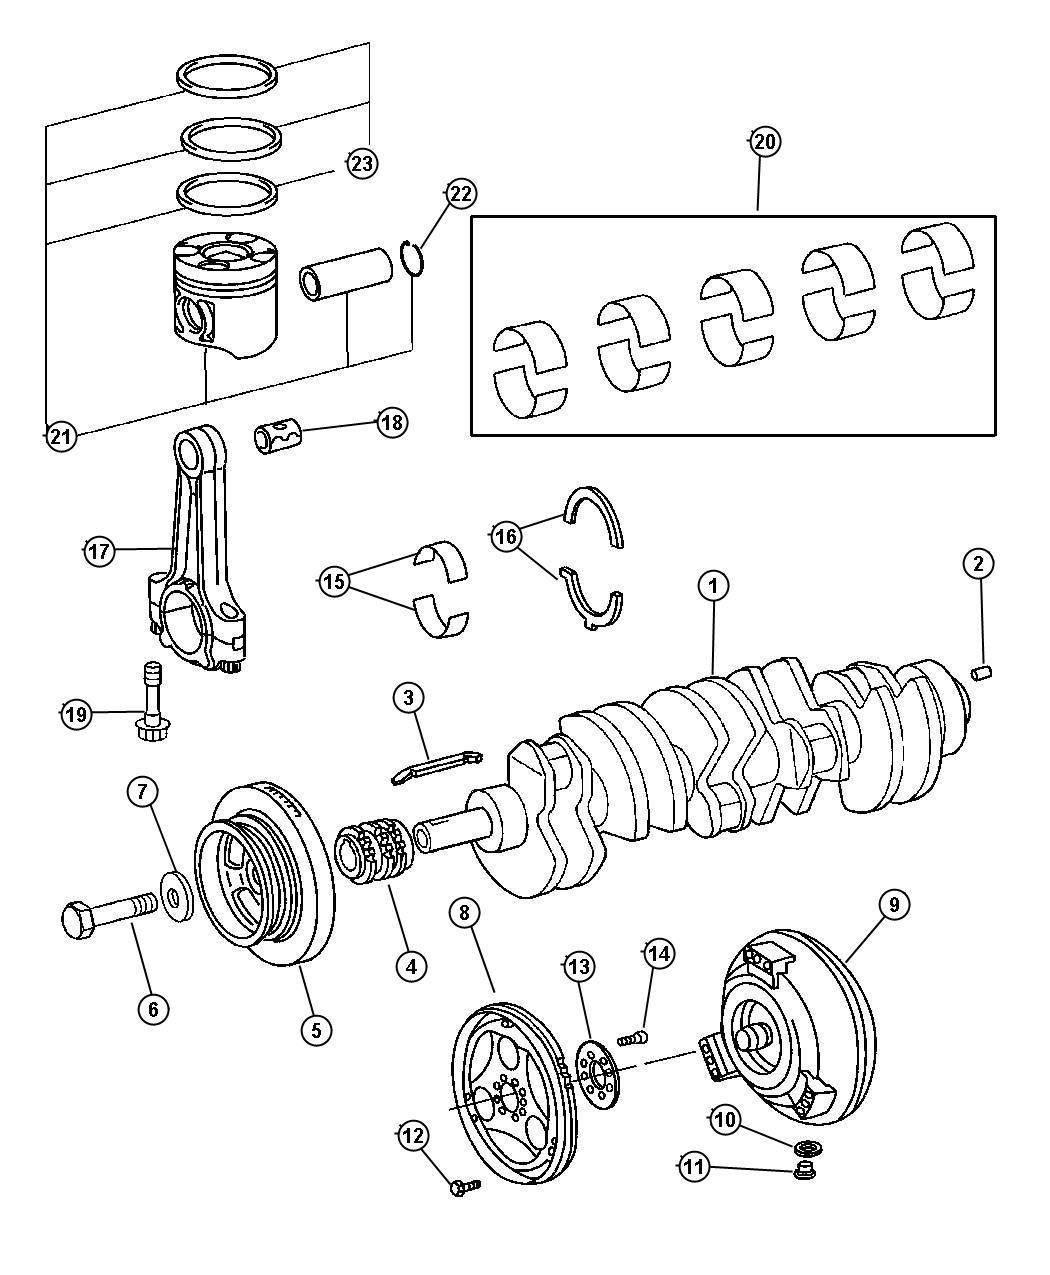 Dodge Sprinter 2500 Crankshaft And Pistons